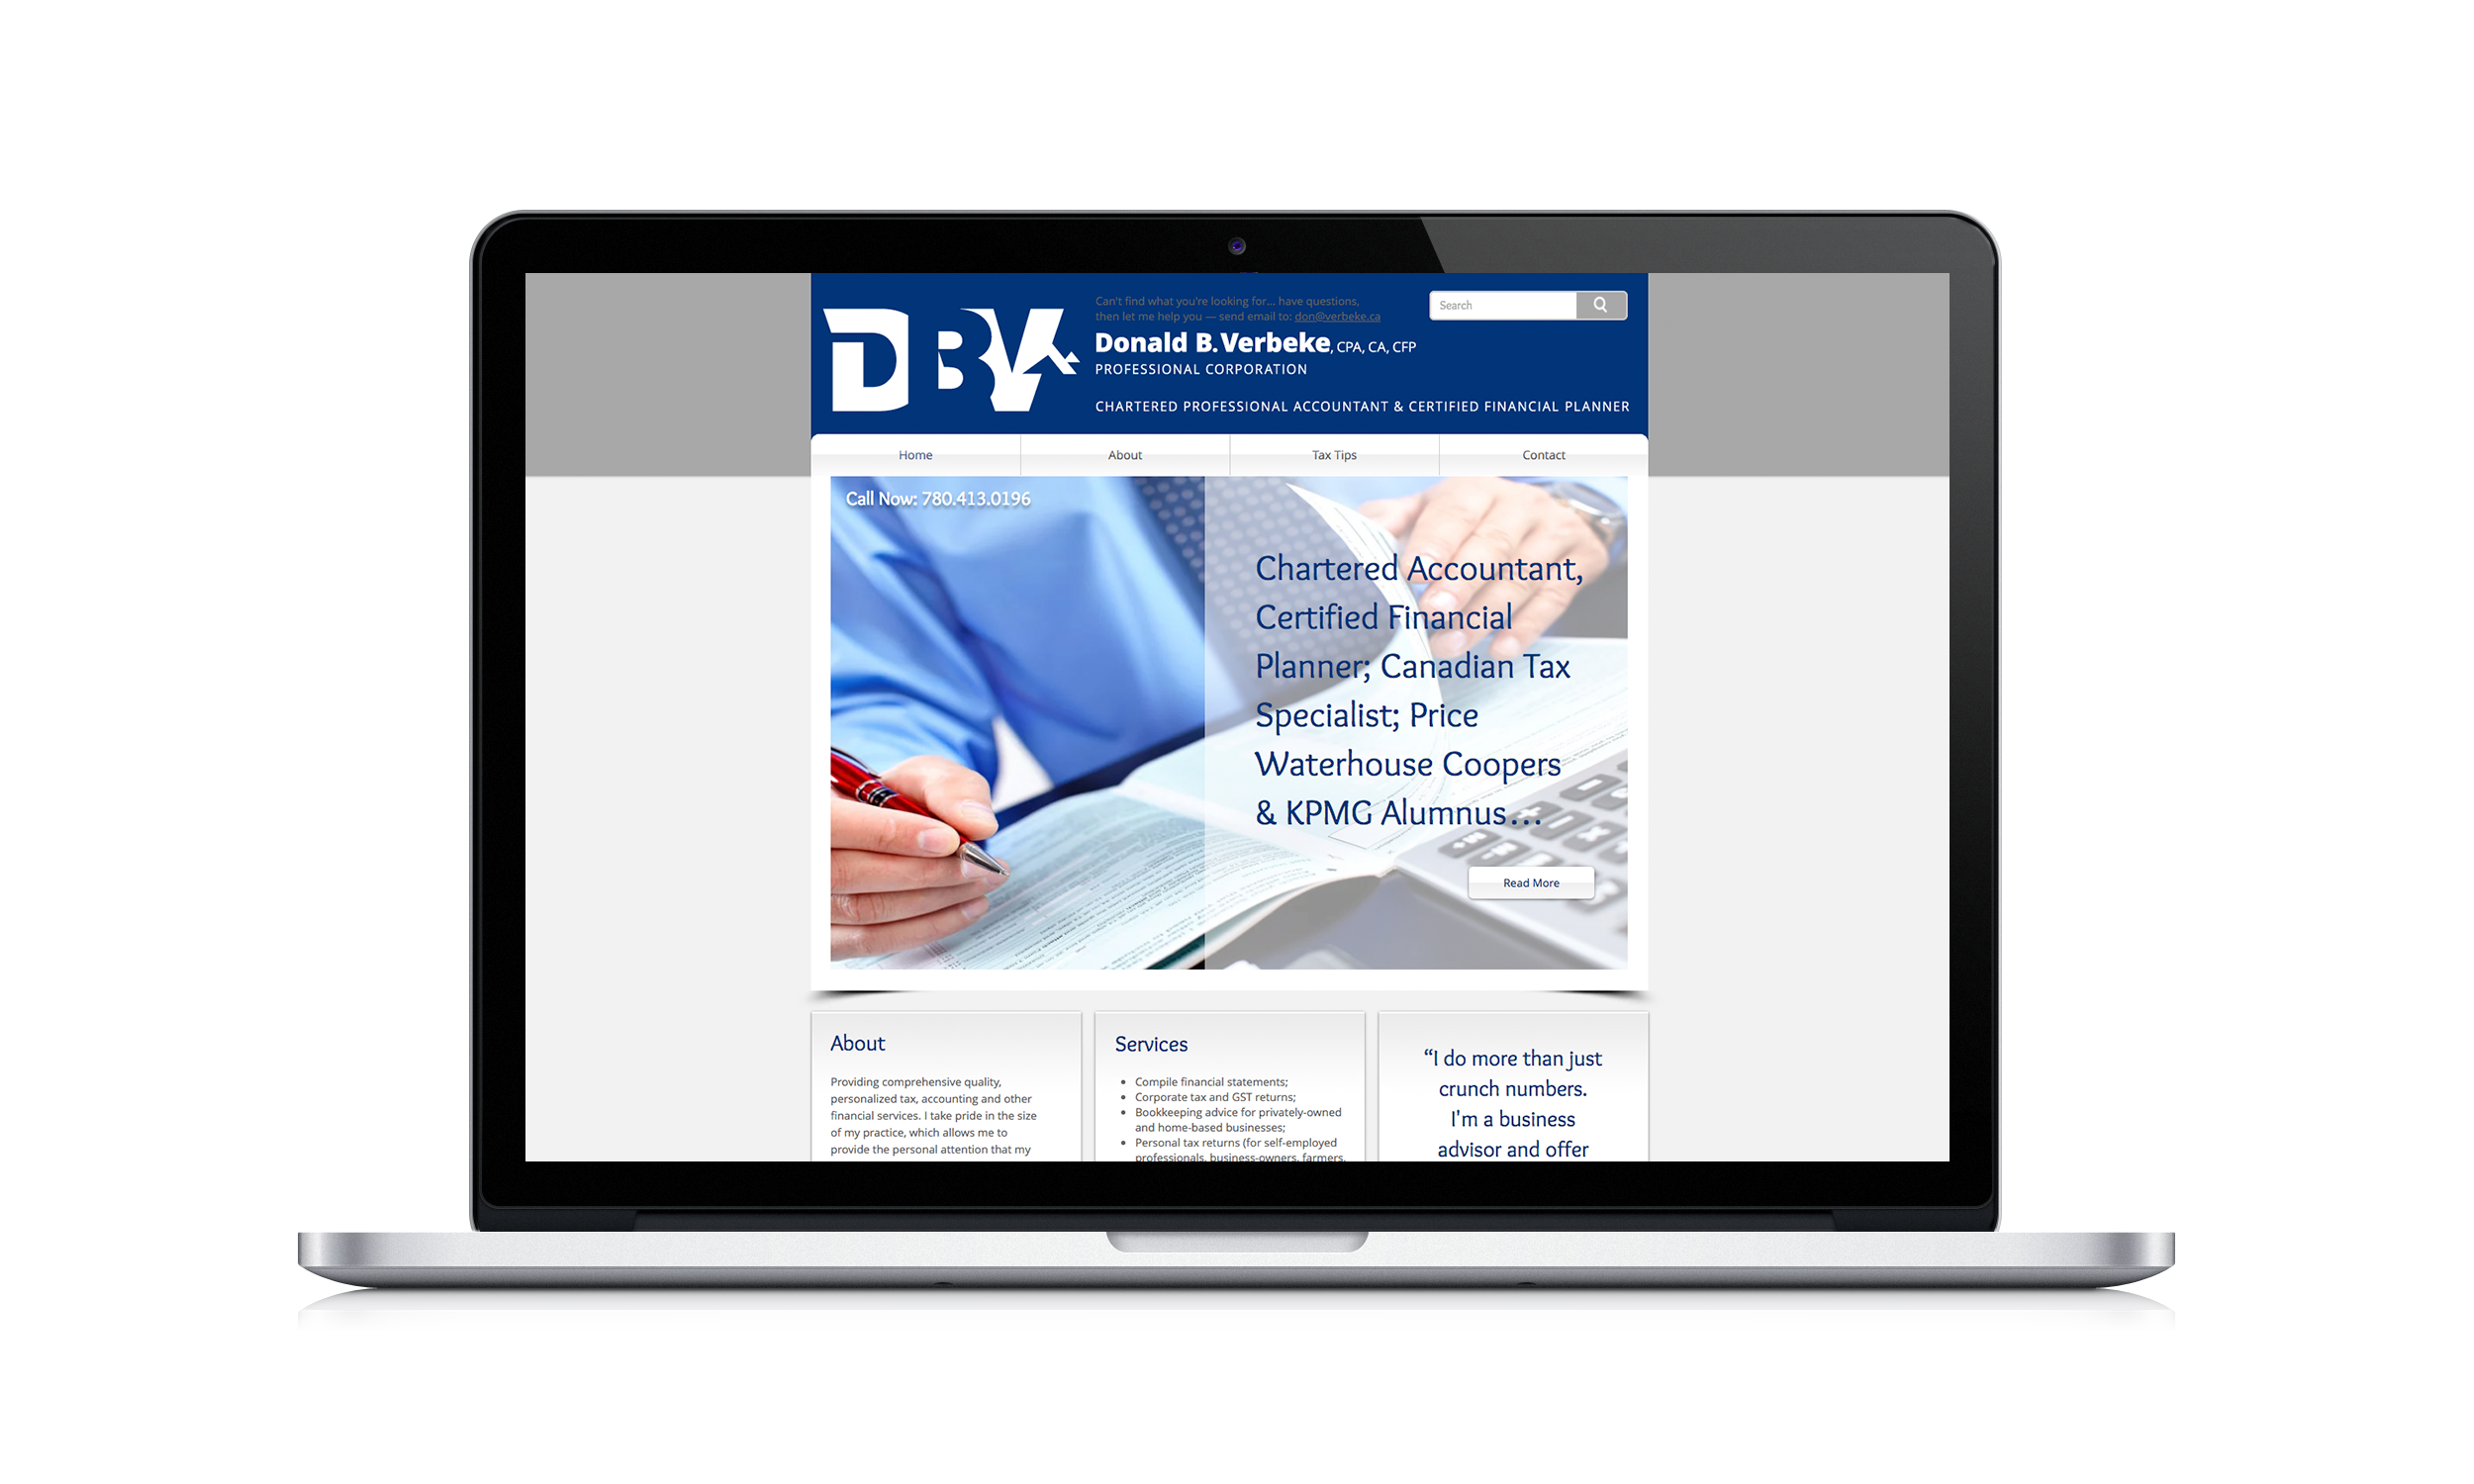 DBV Professional Corporation